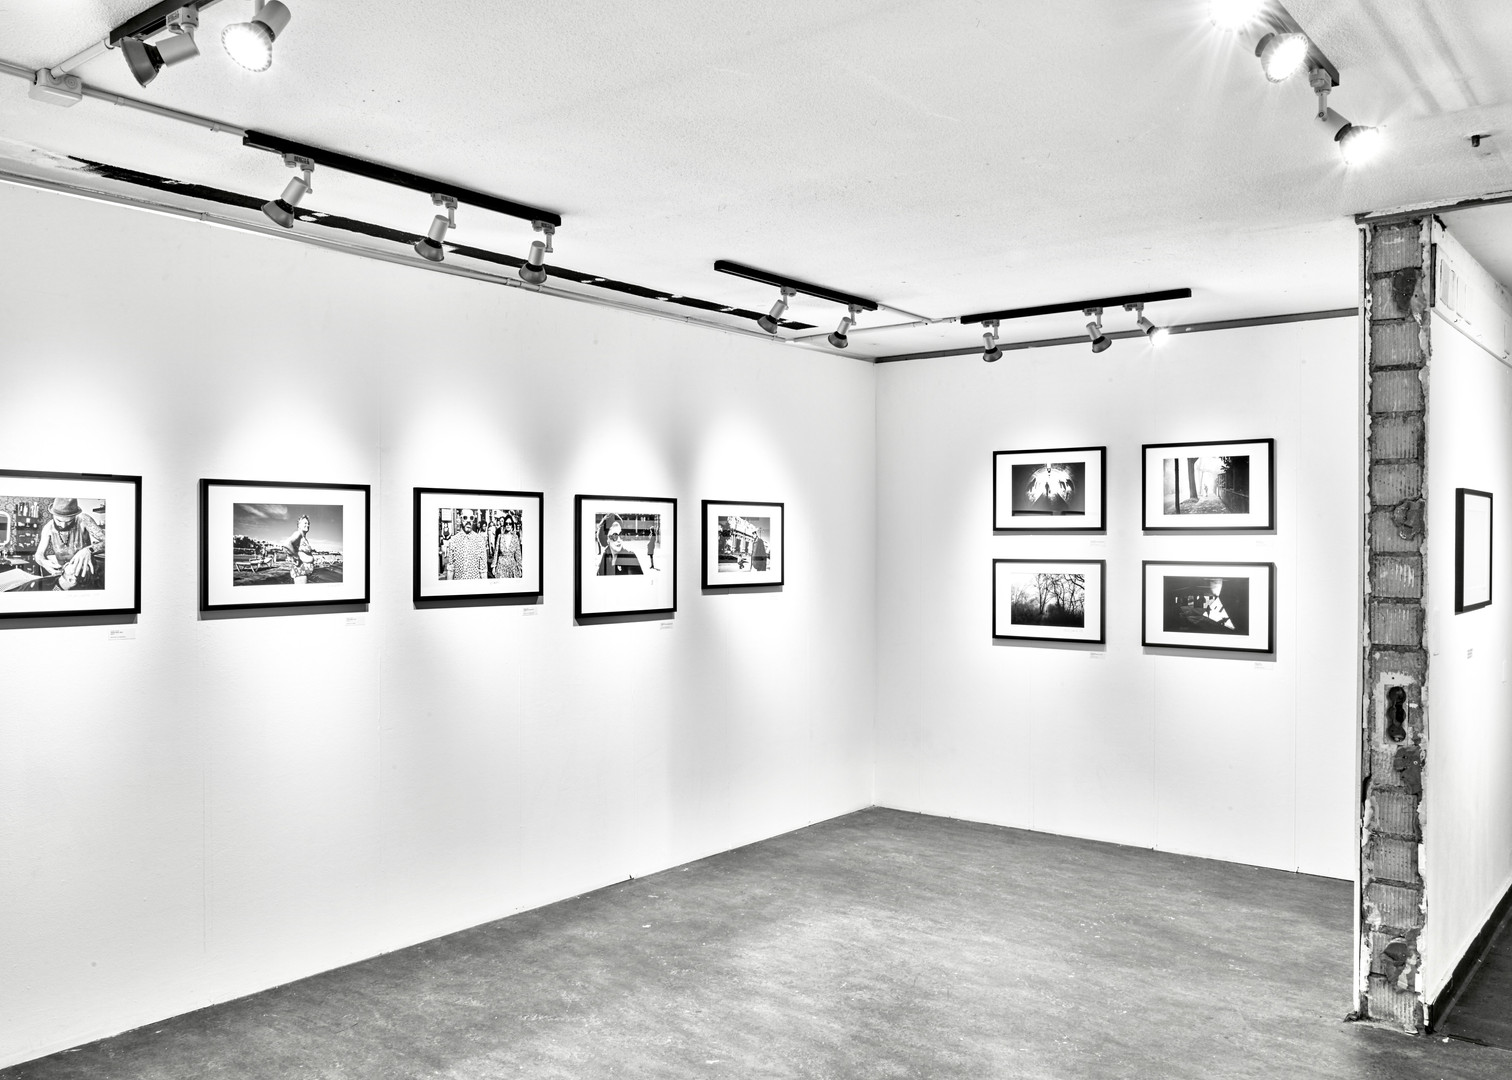 007_Ausstellung_18.jpg